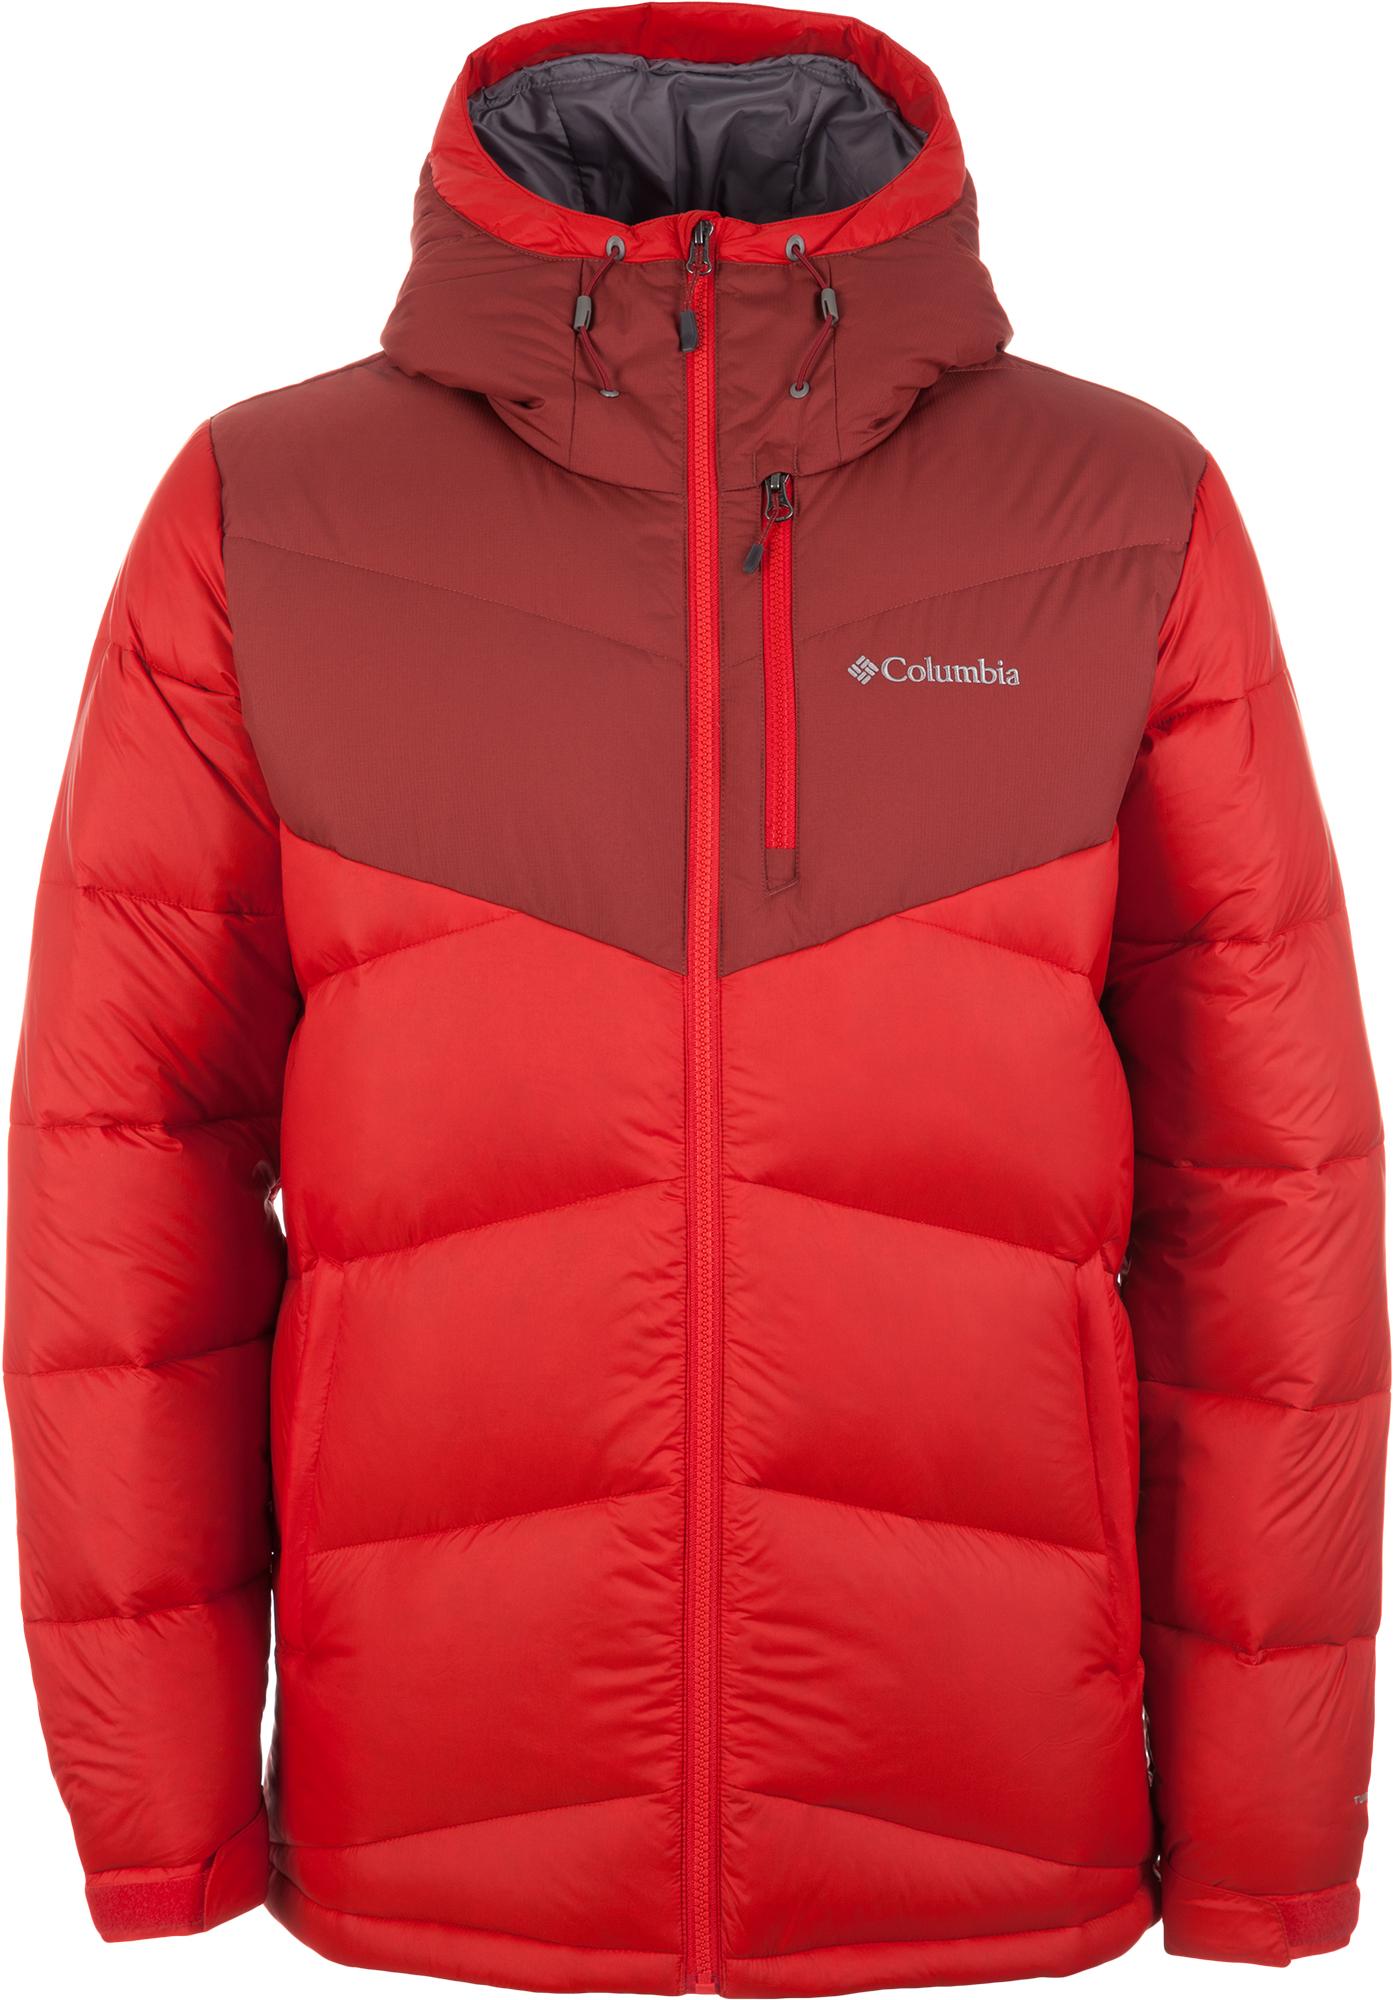 Columbia Куртка пуховая мужская Columbia Sylvan Lake II 630 TurboDown, размер 48-50 цены